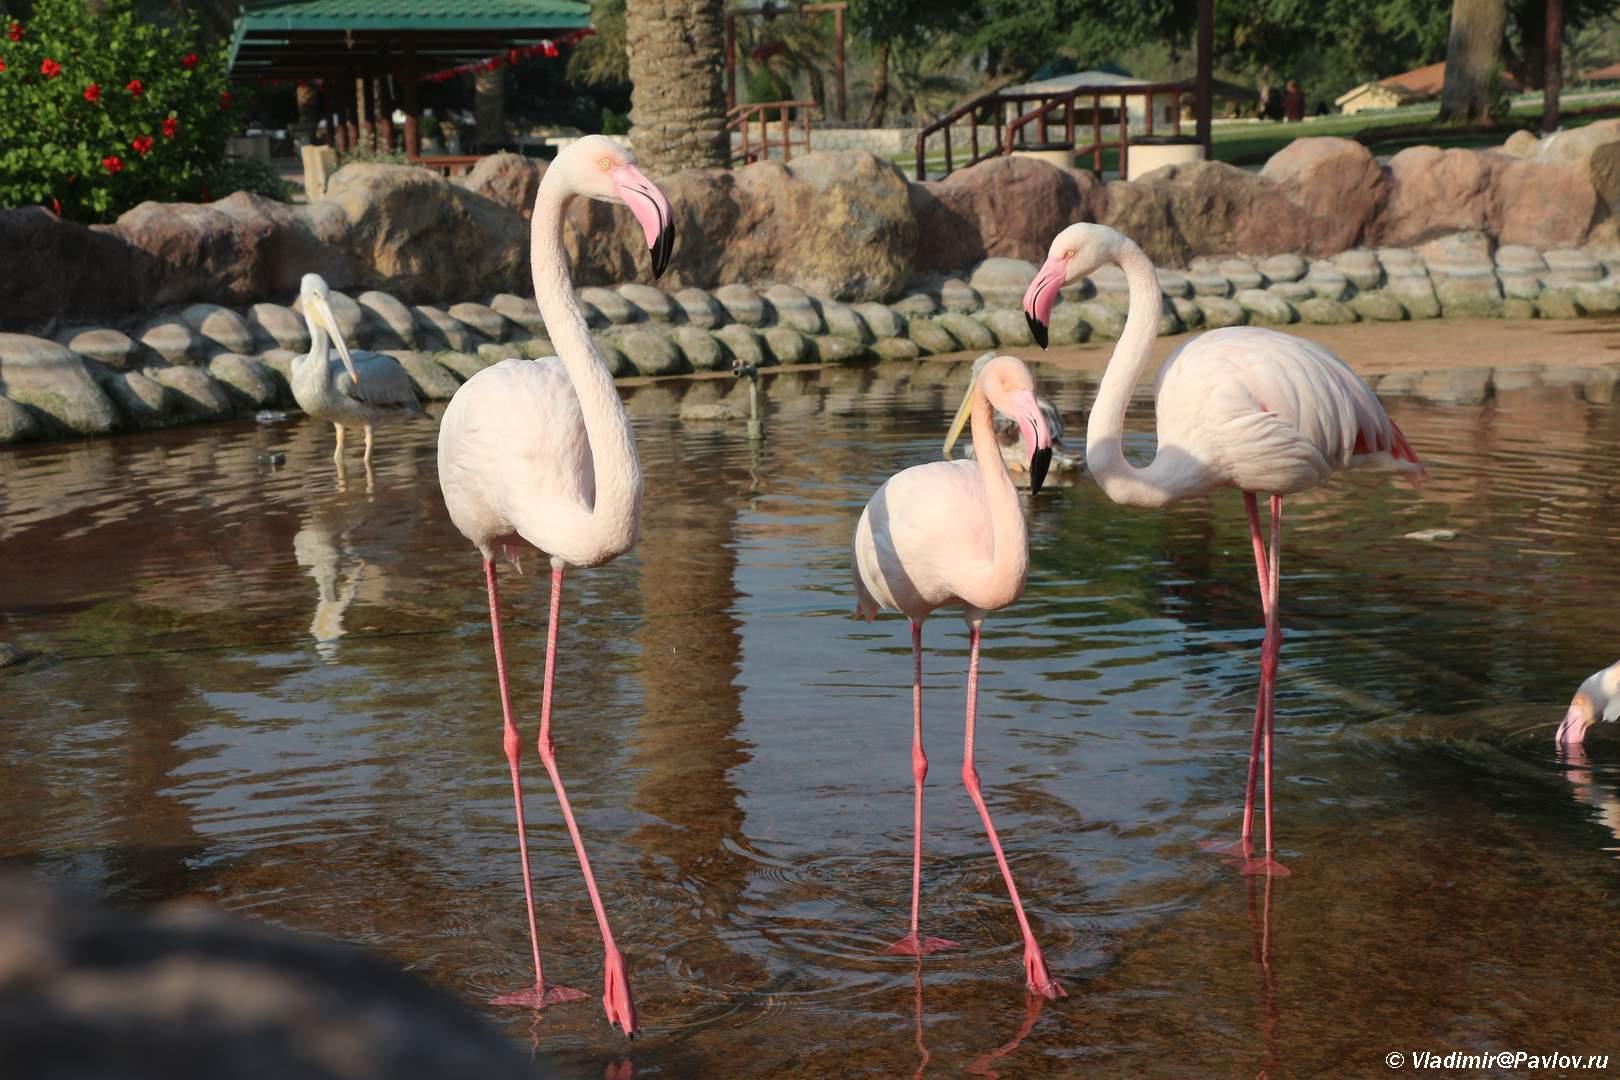 Semya rozovyh flamingo. Prirodnyj park Al Arin. Al Areen Wildlife Park. Bahrain - Розовые фламинго в Бахрейне. Природный парк Аль-Арин. Al Areen Wildlife Park